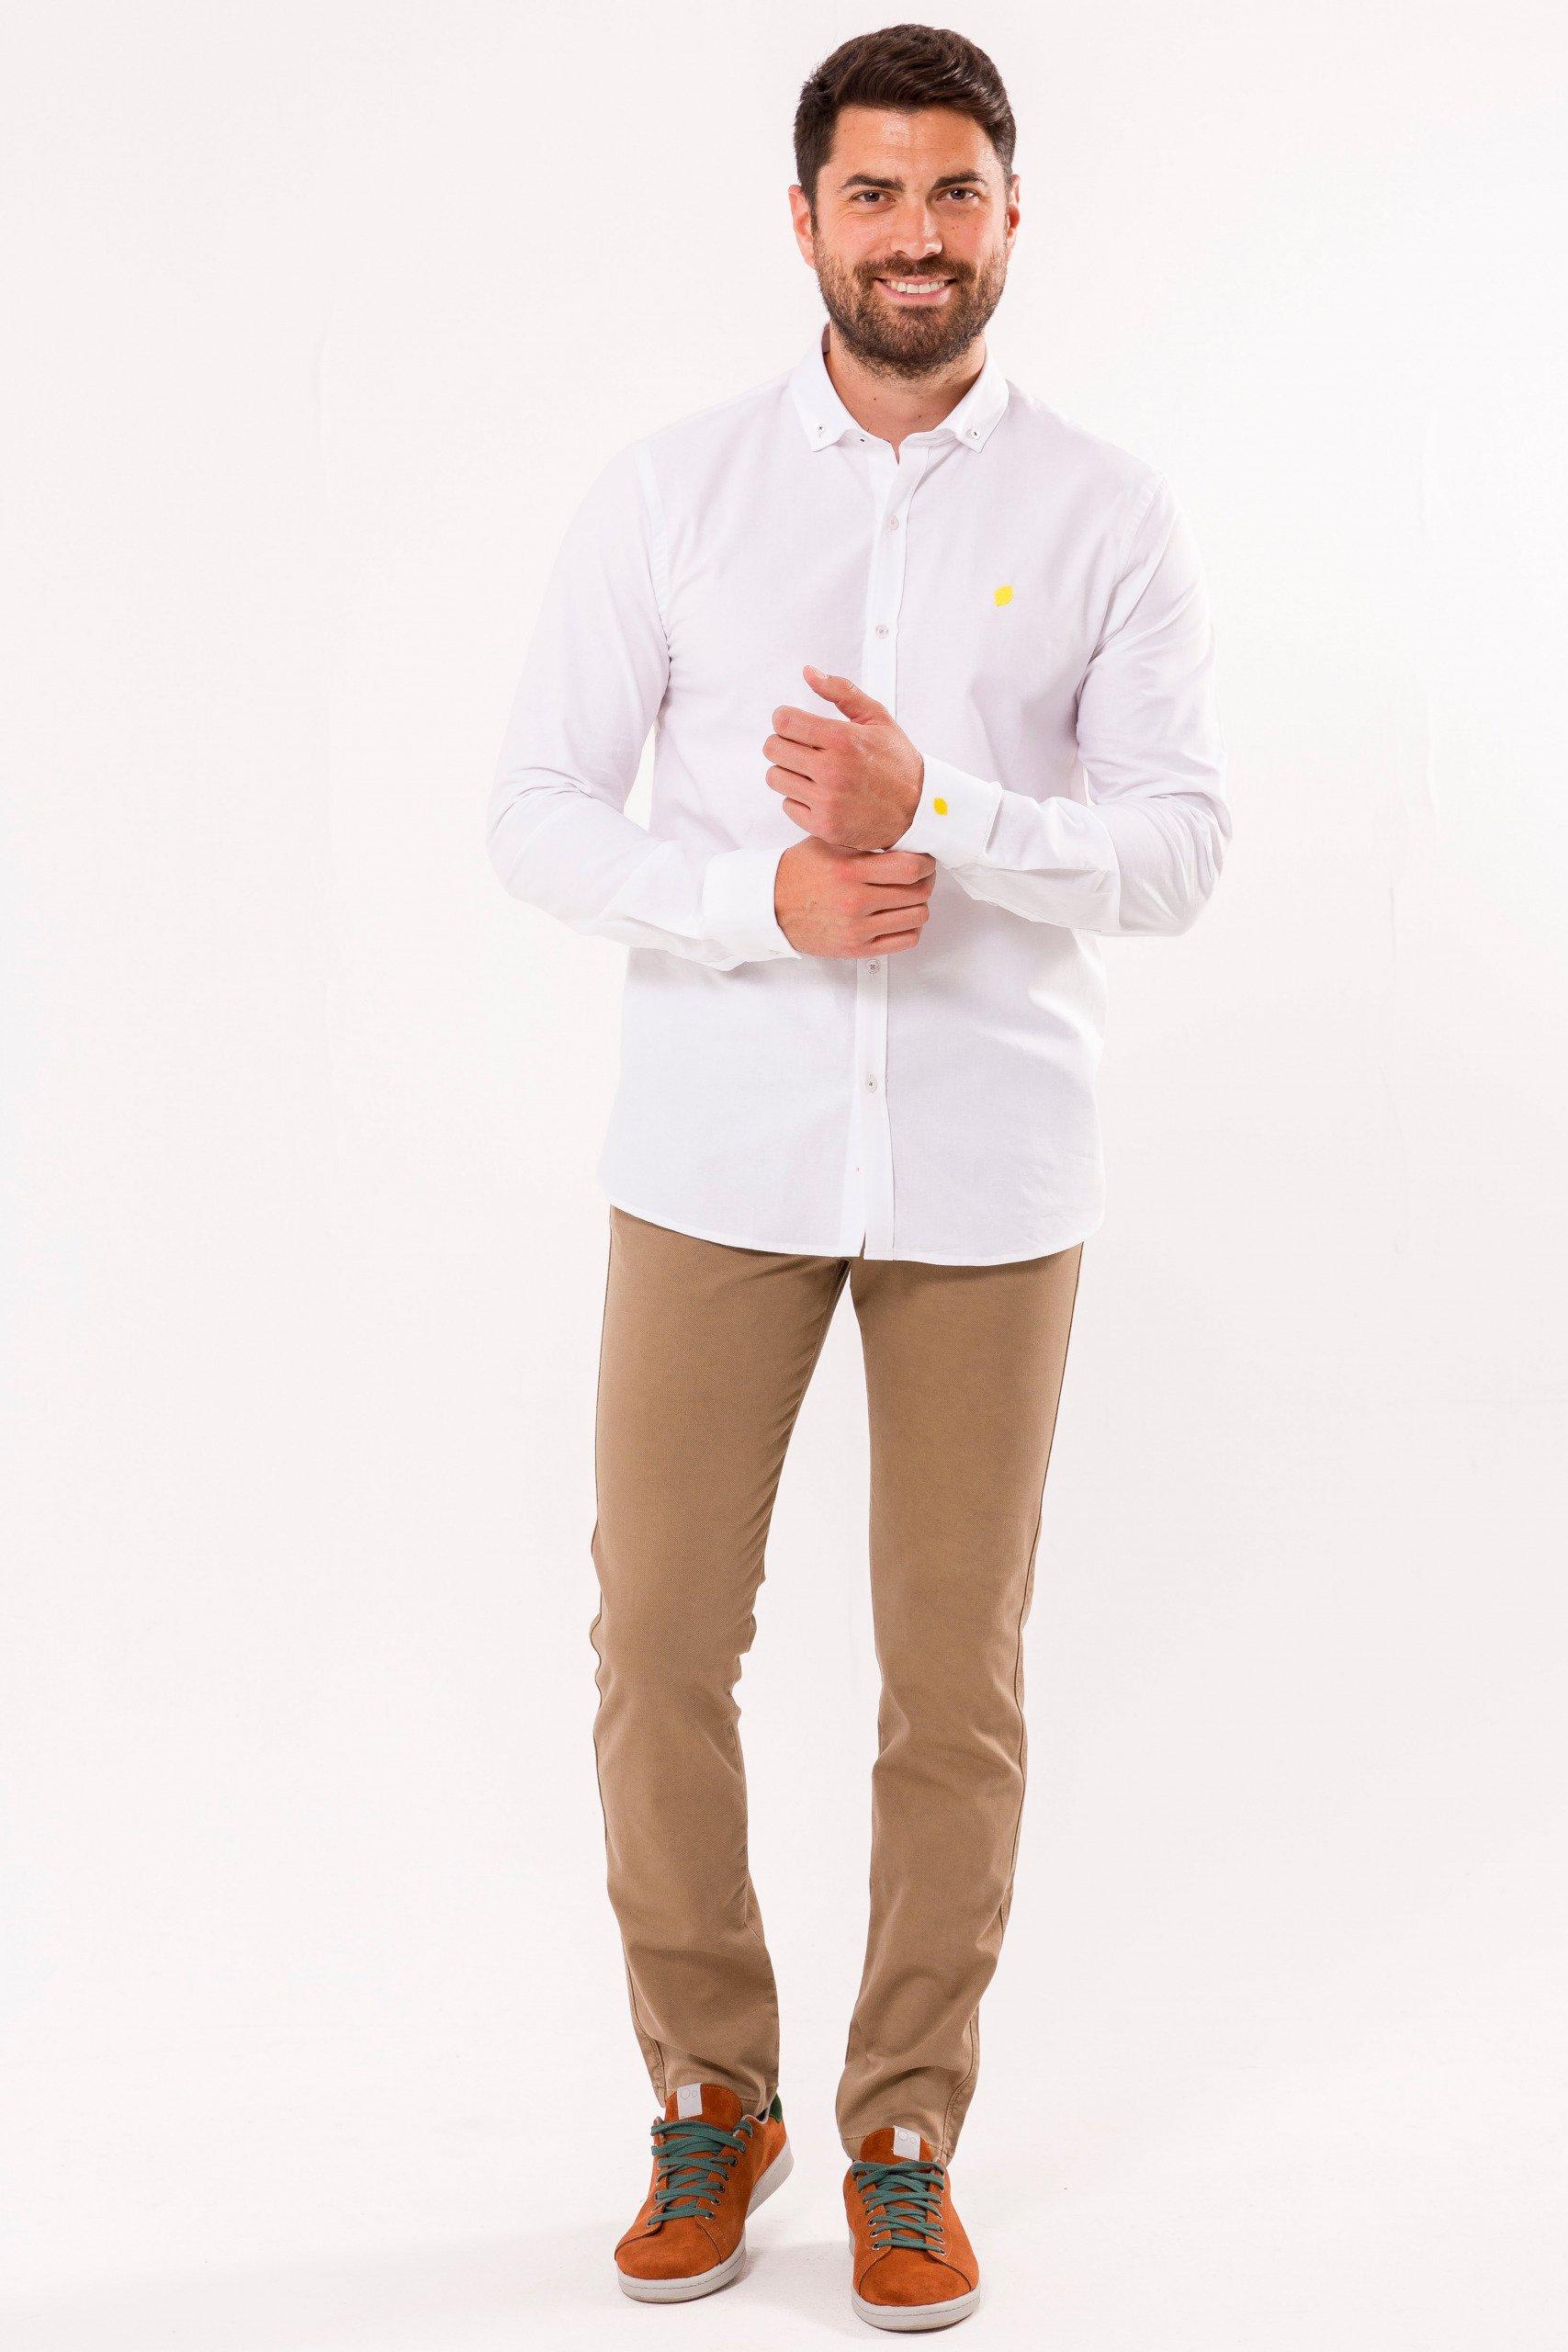 pantalon-sir-lemon-chino-casual-color-tostado